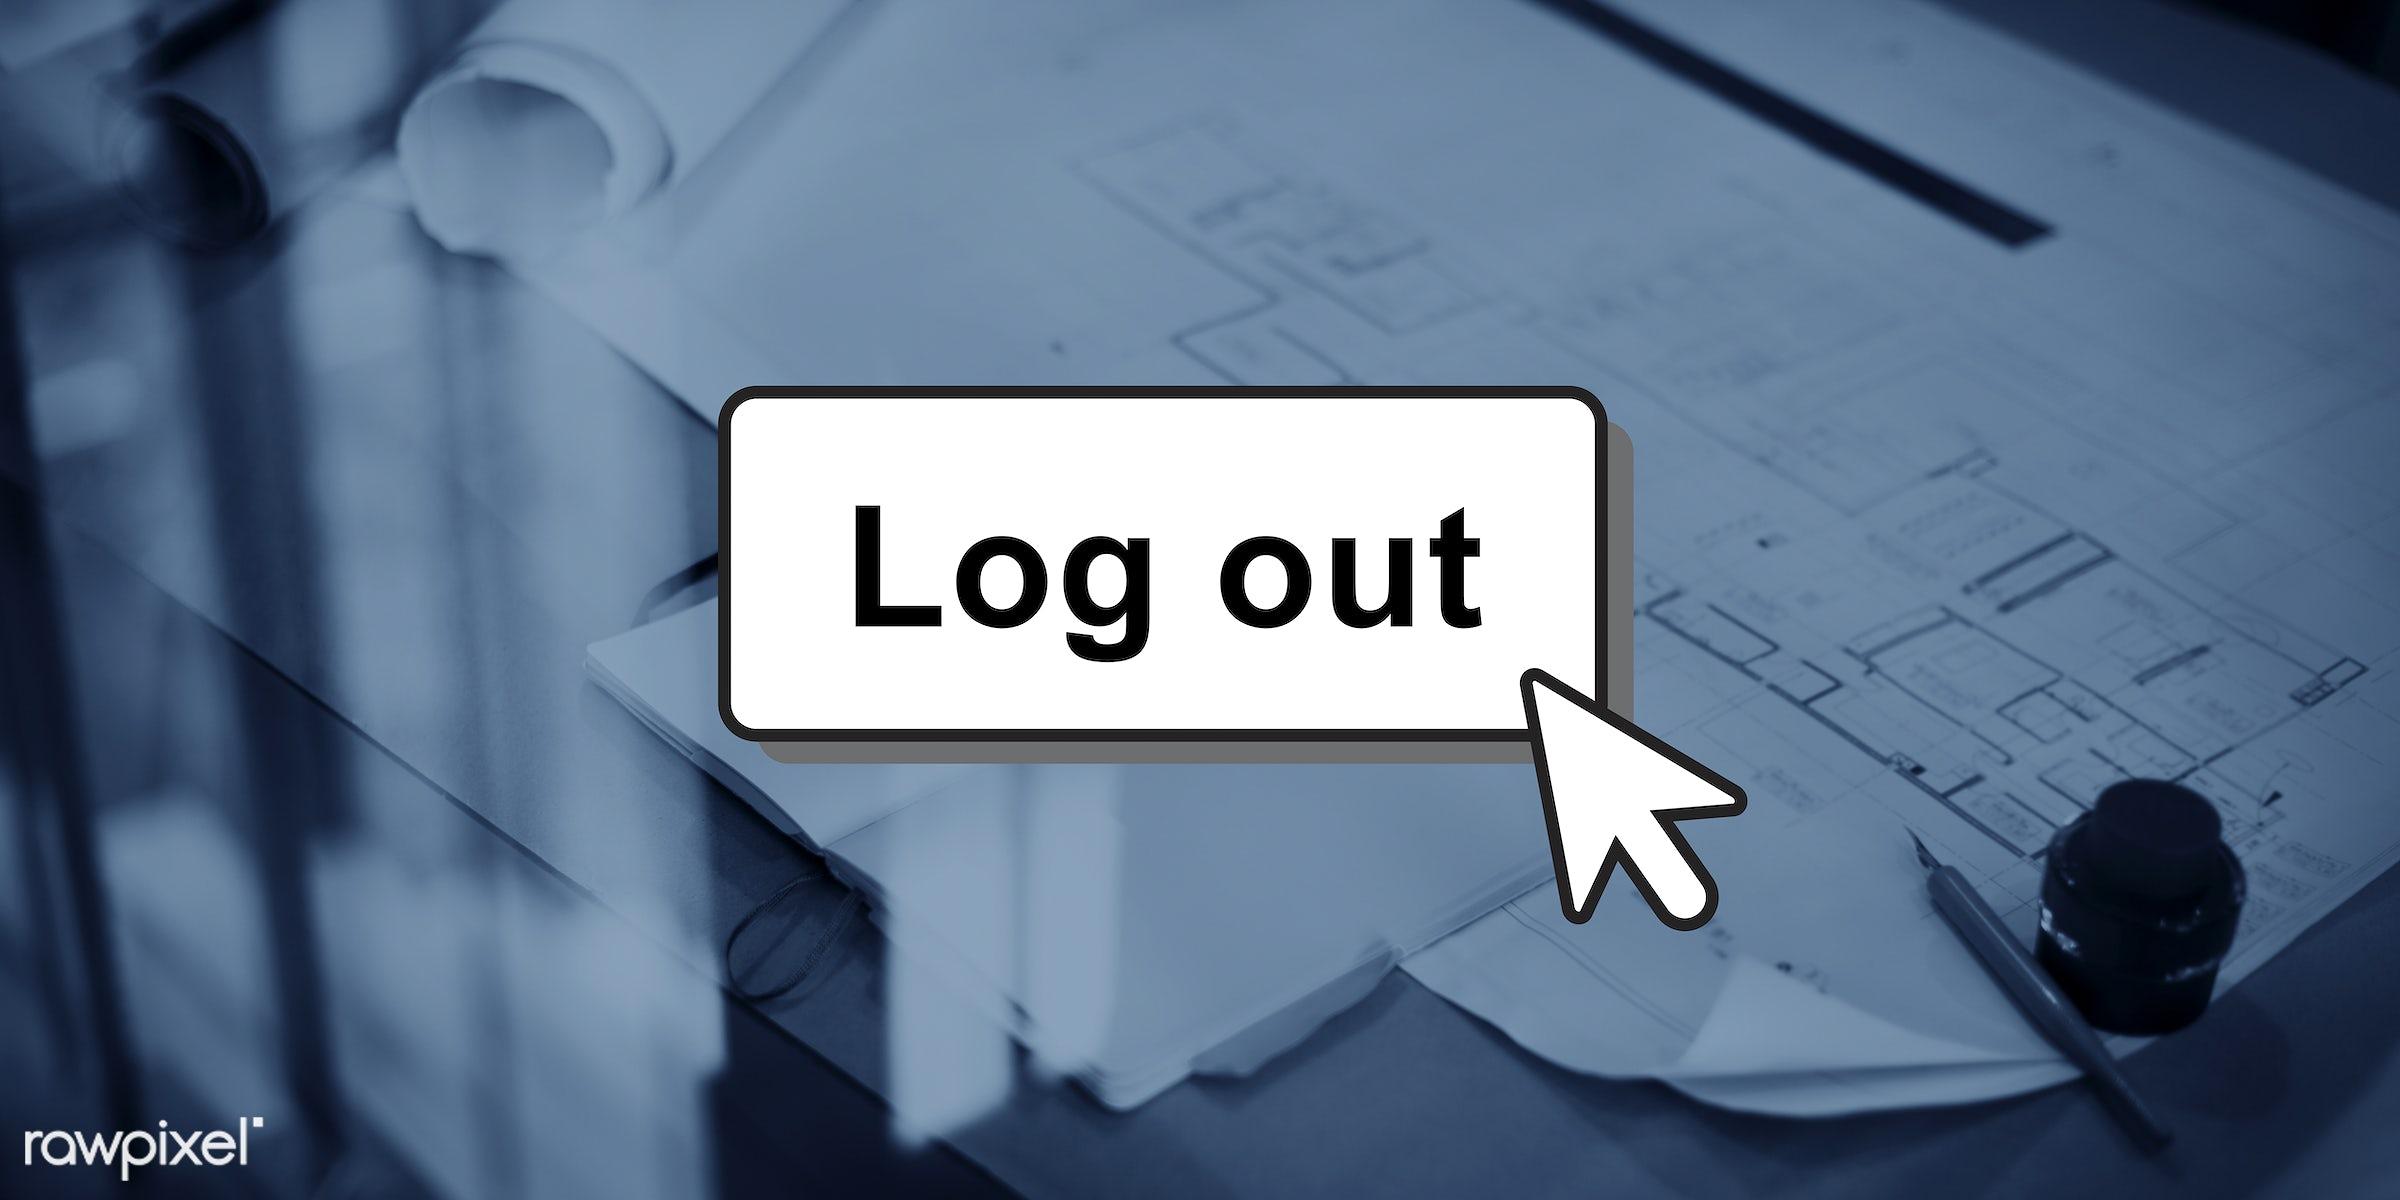 architect, blueprint, business, design, development, disconnect, documents, dspace, ideas, interior, internet, log off, log...